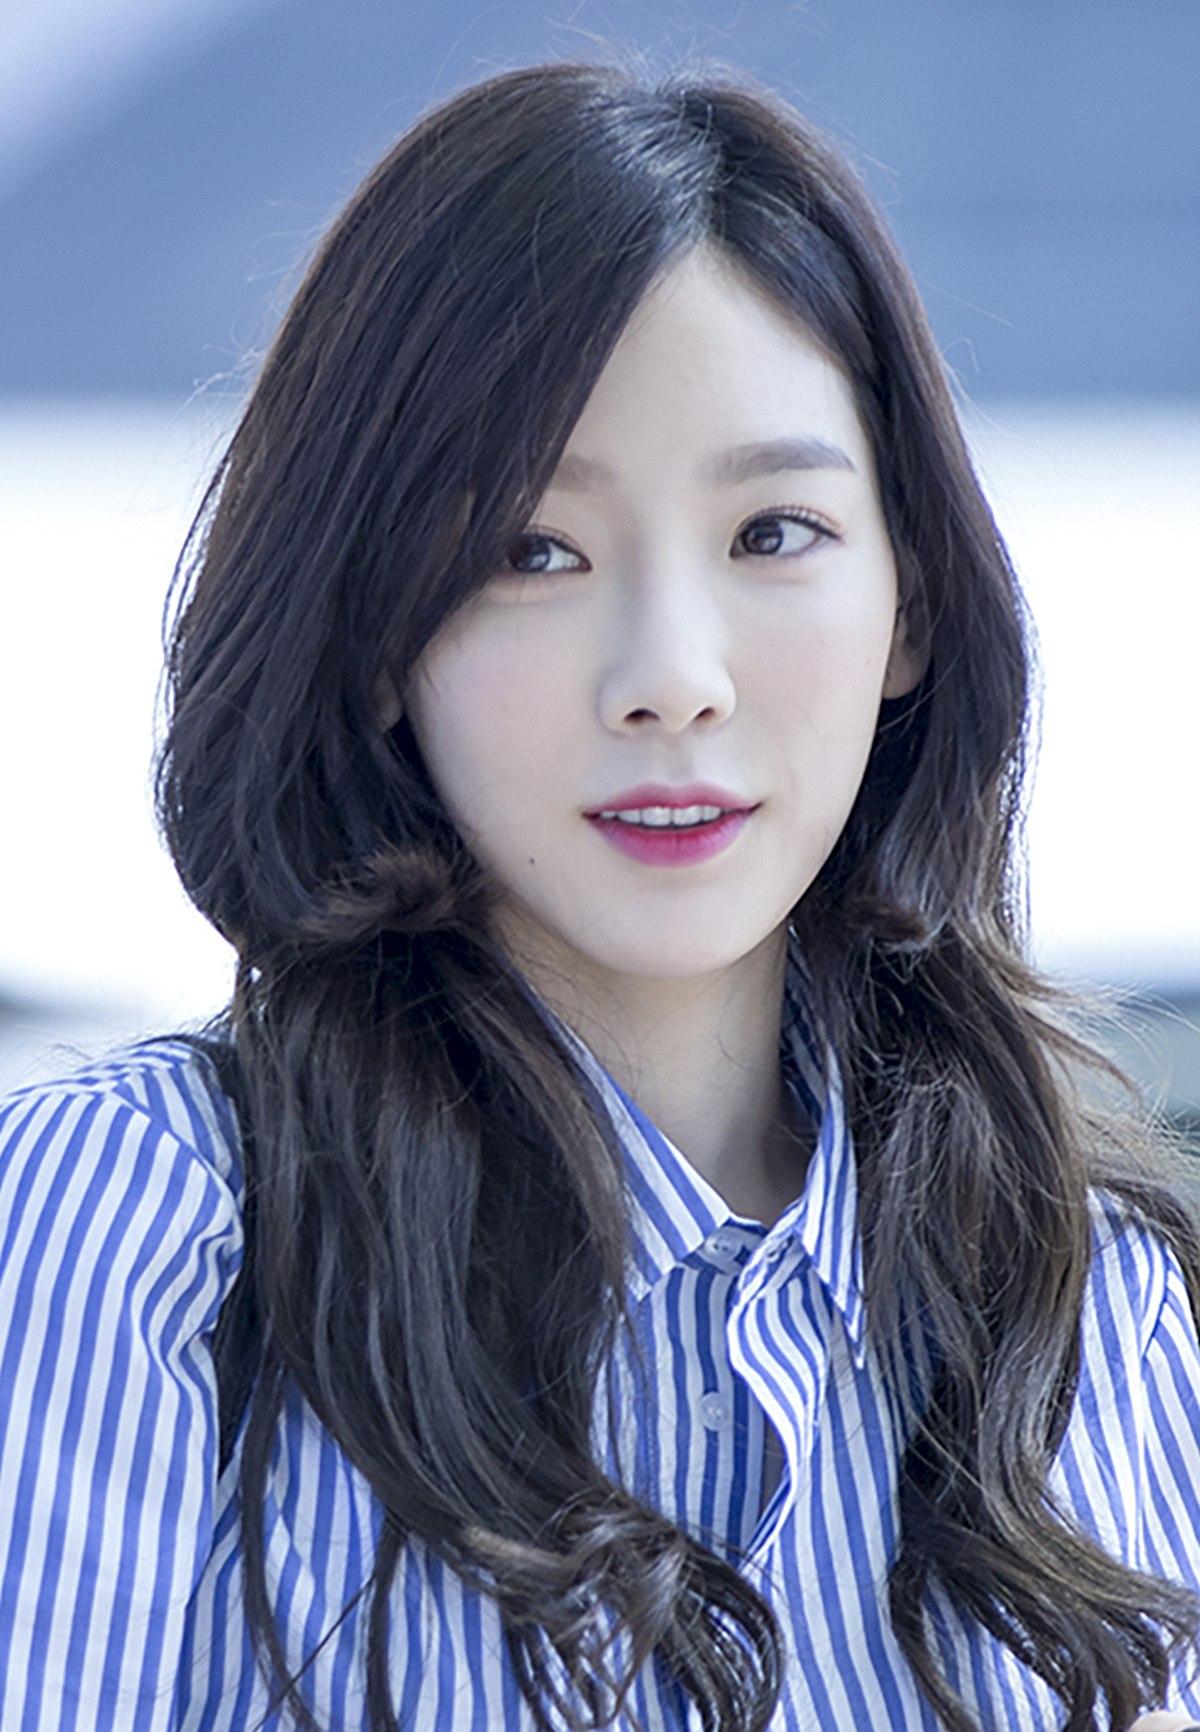 Kim Tae Yeon Wikipedia Ting Vit